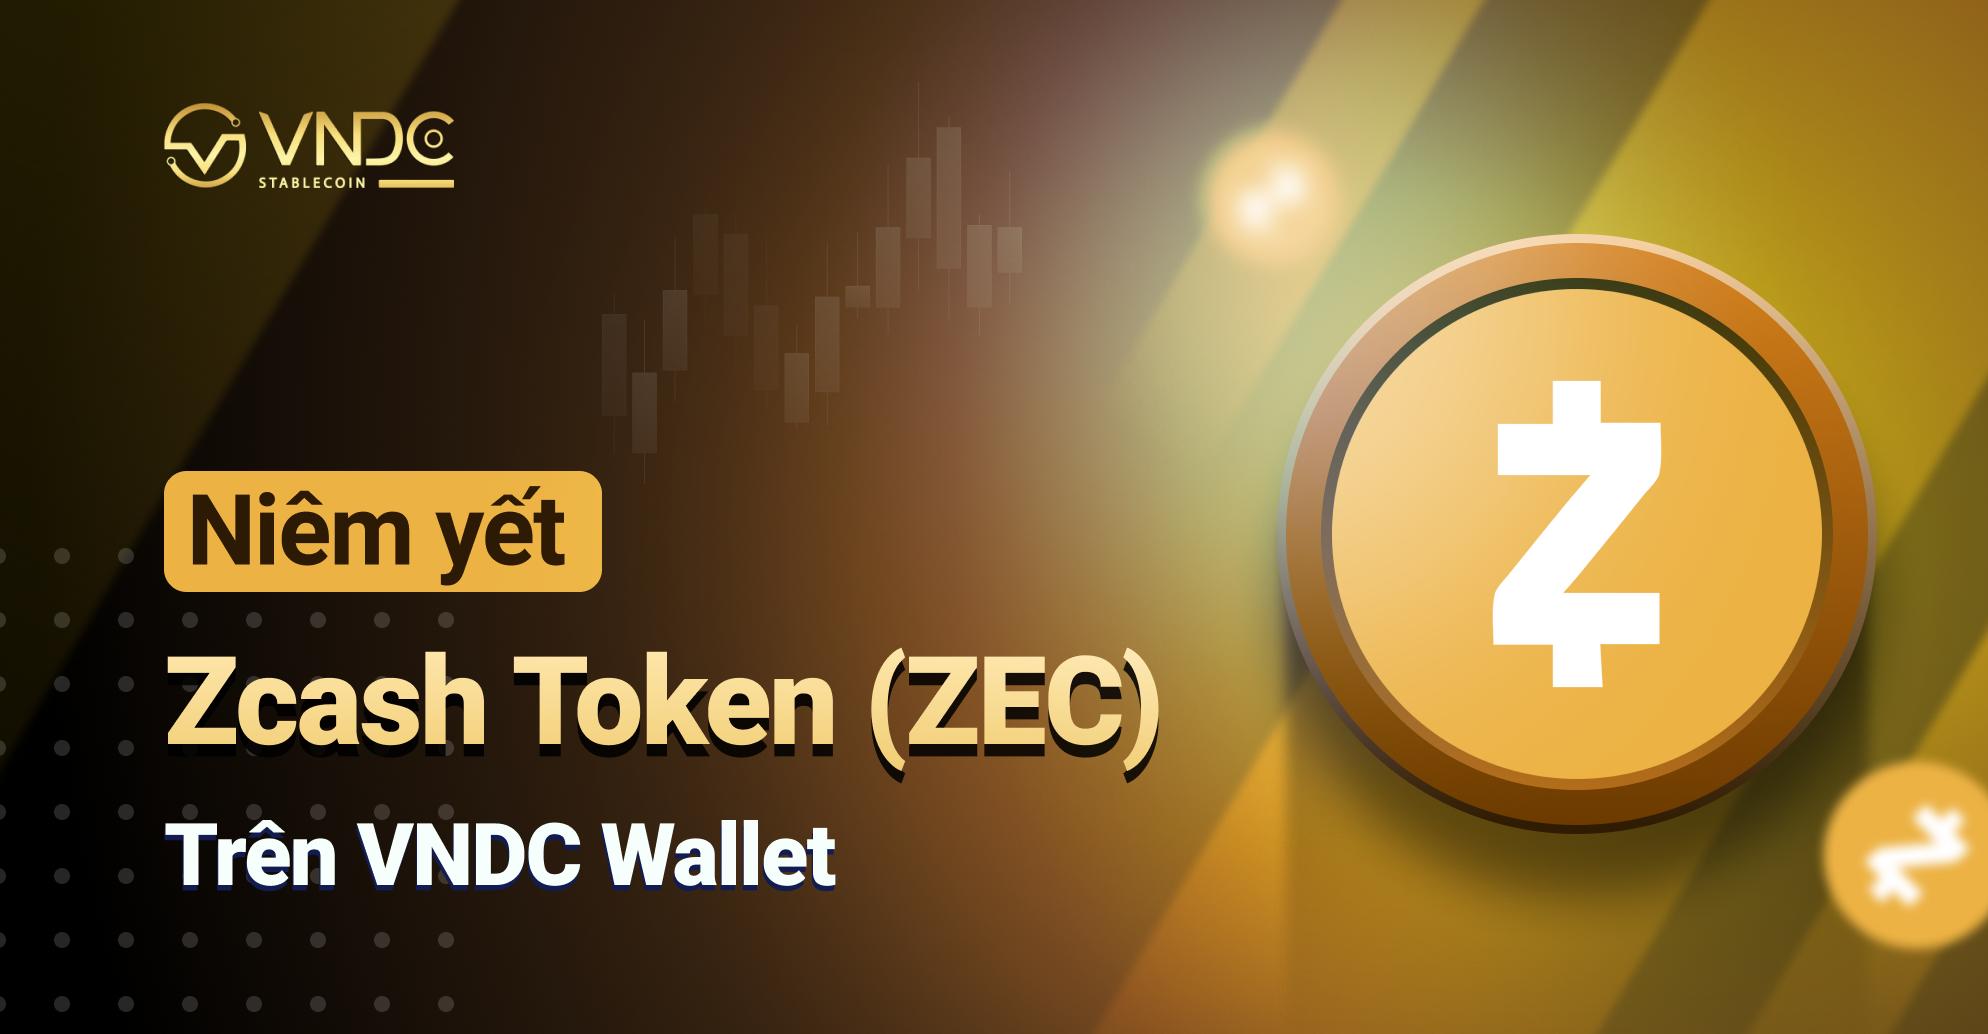 Niêm yết Zcash Token (ZEC) trên VNDC Wallet